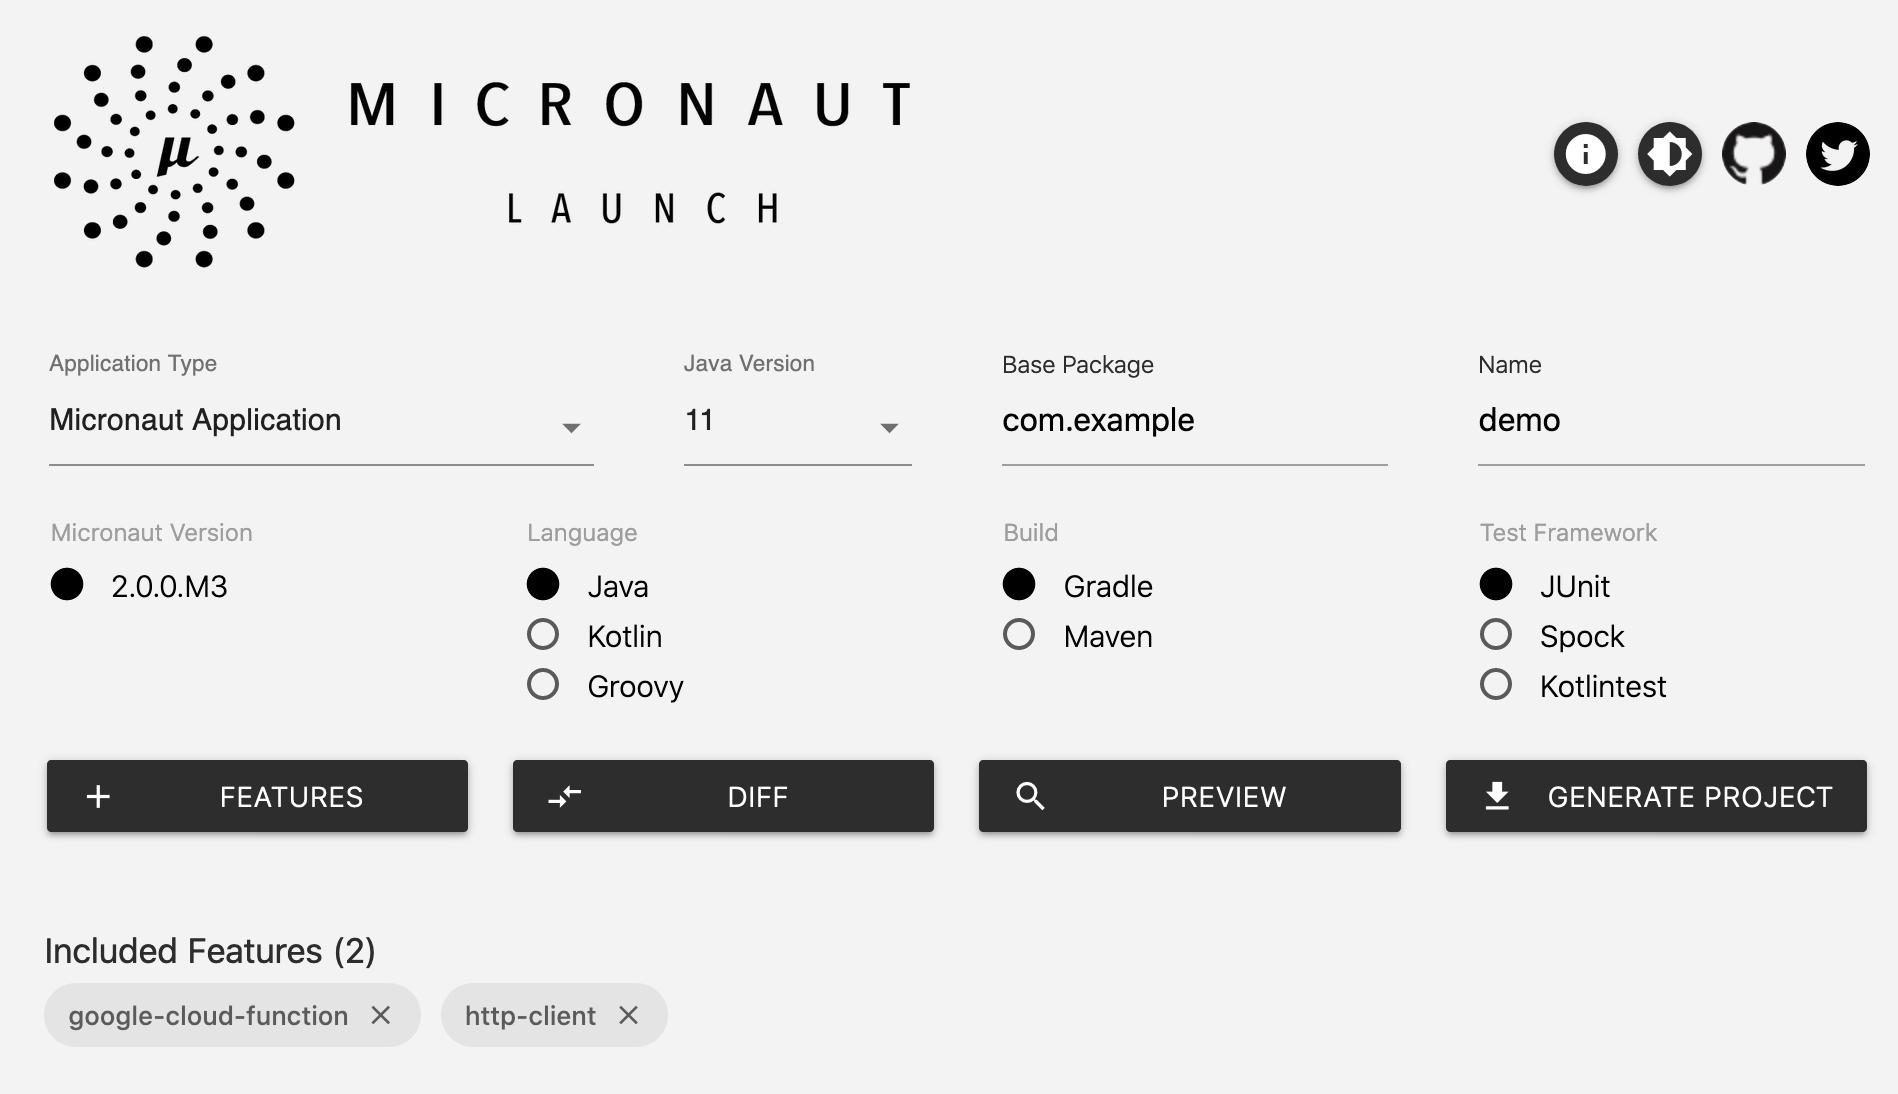 Micronaut launch